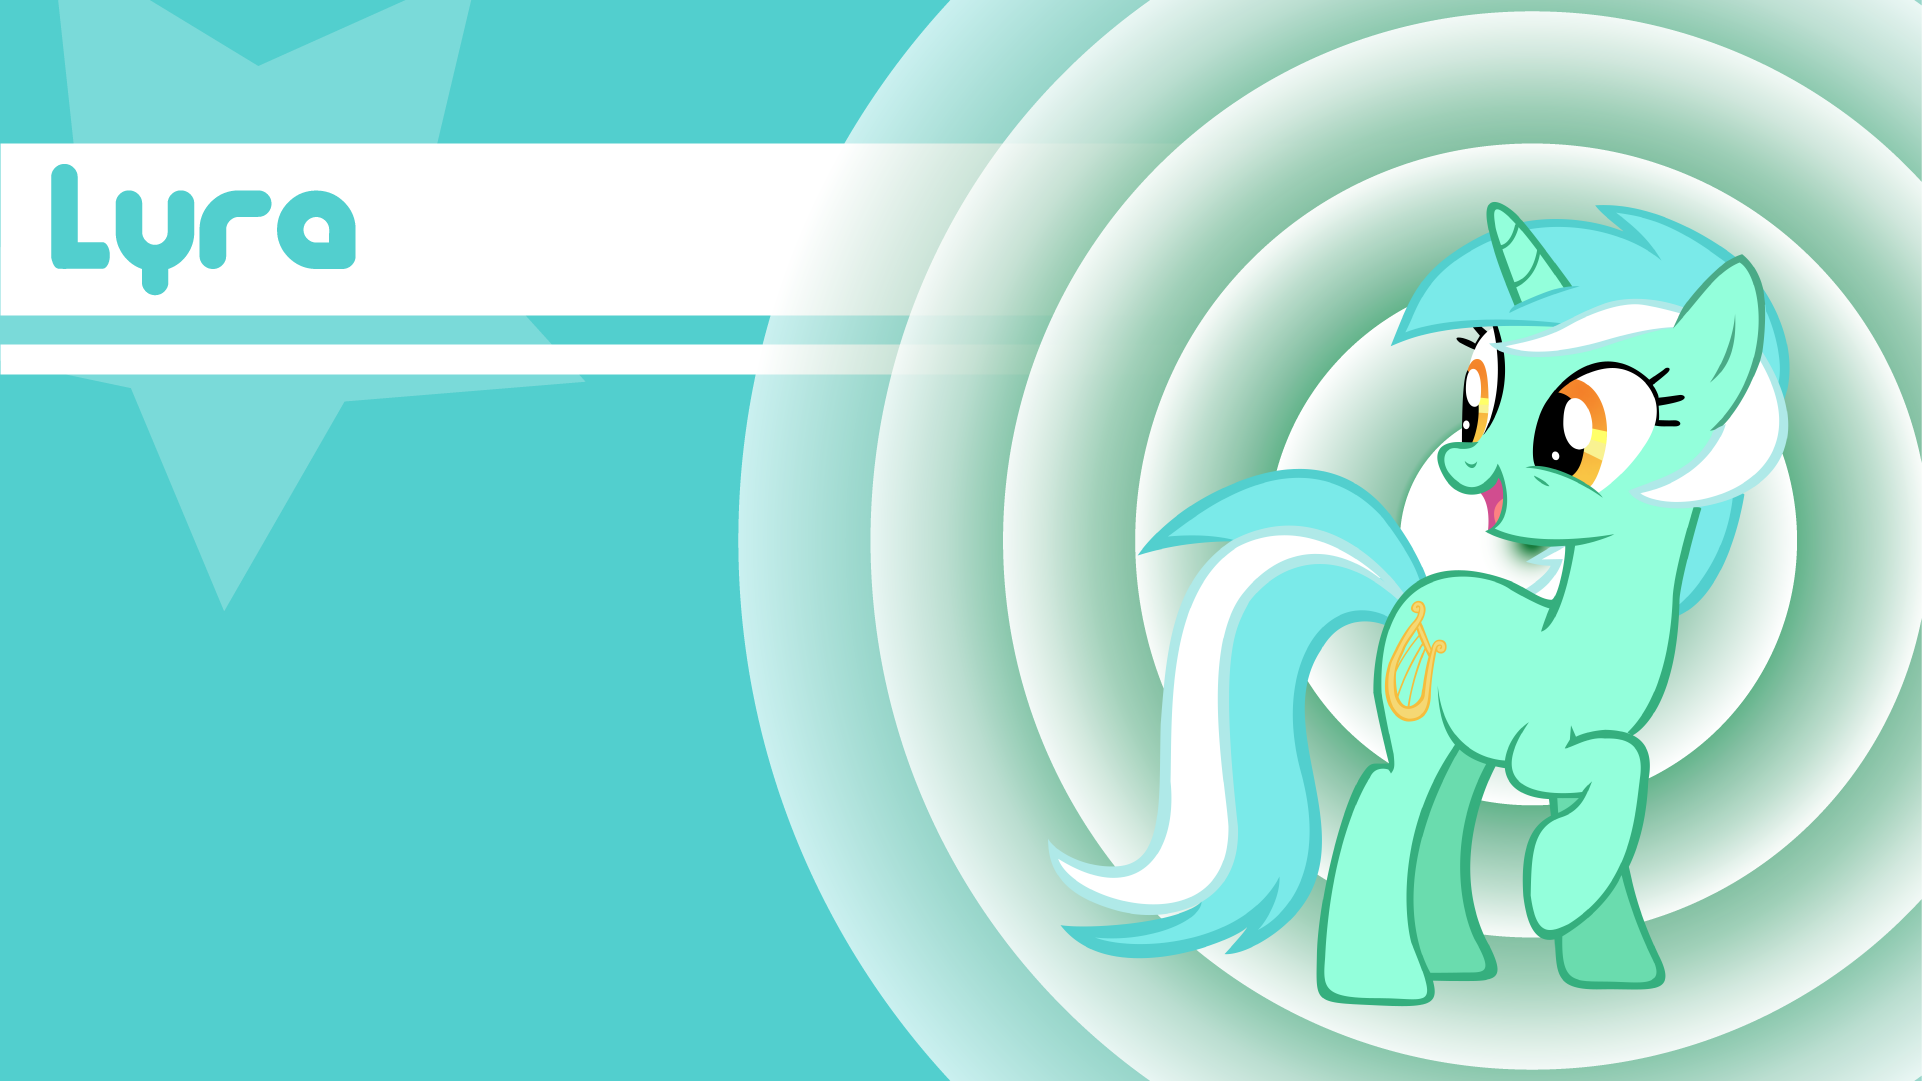 Lyra Heartstrings Wallpaper by LordVurtax and Shelmo69